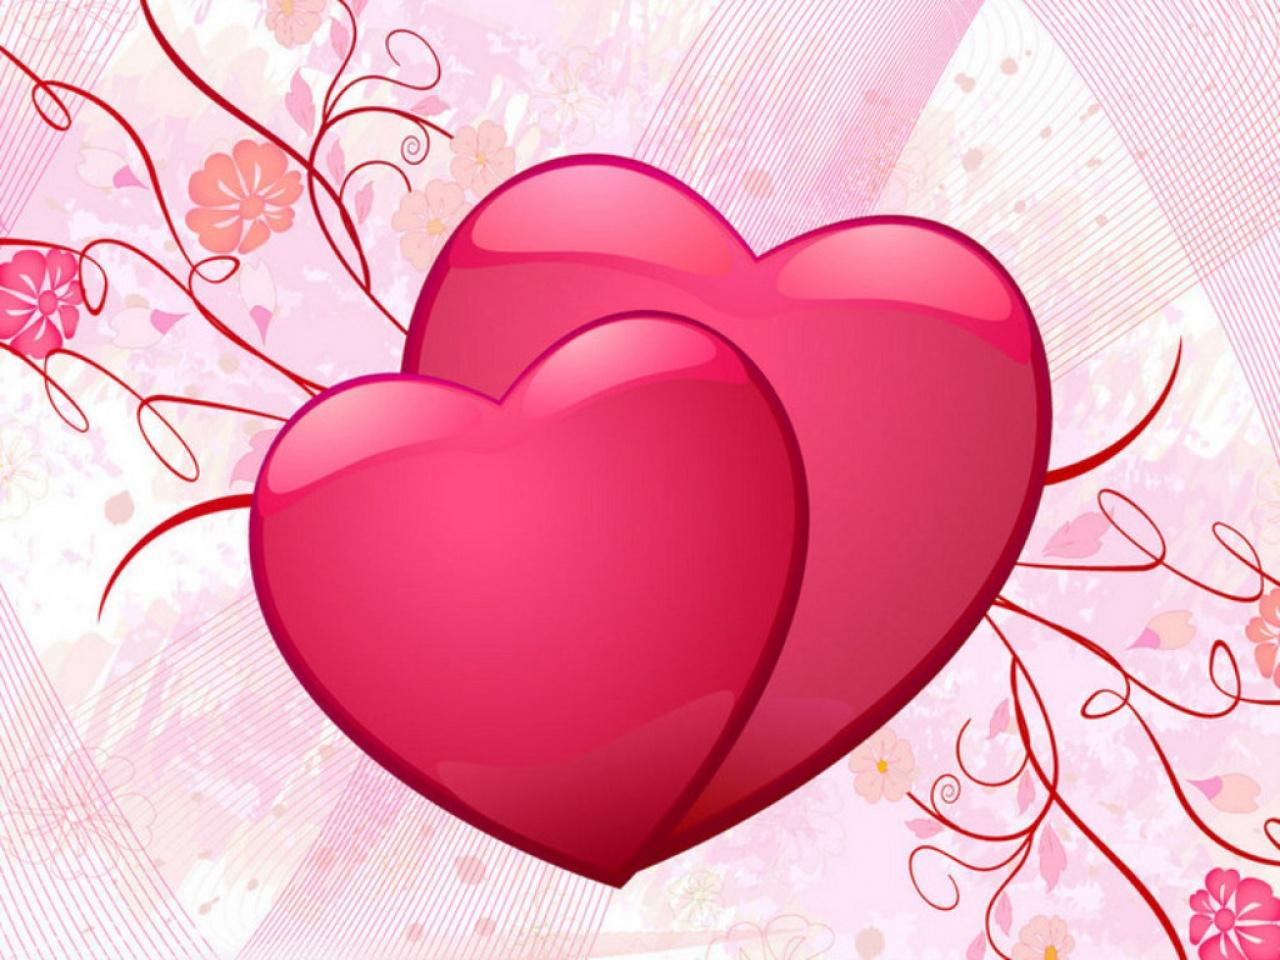 Frases De Amor Para Mi Esposo Dedica Estas Frases A Tu